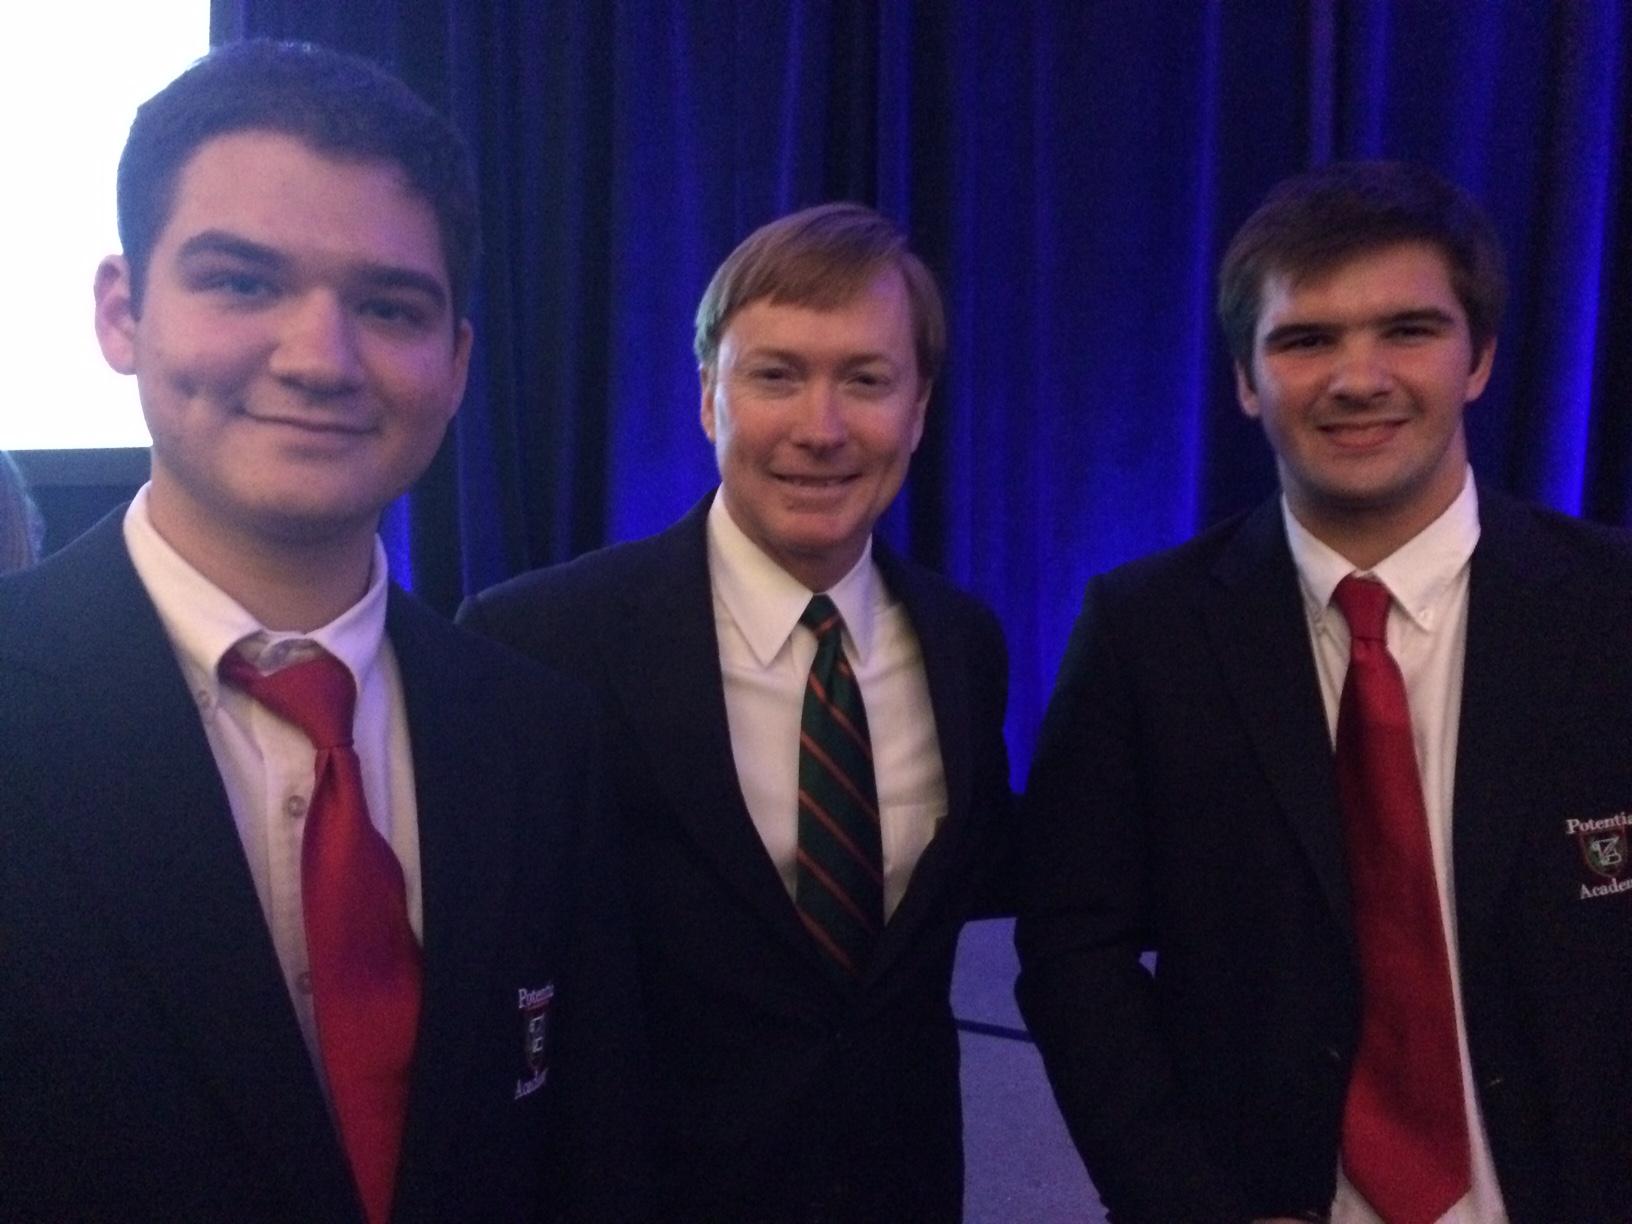 Potentia Students Meet Gubernatorial Candidate